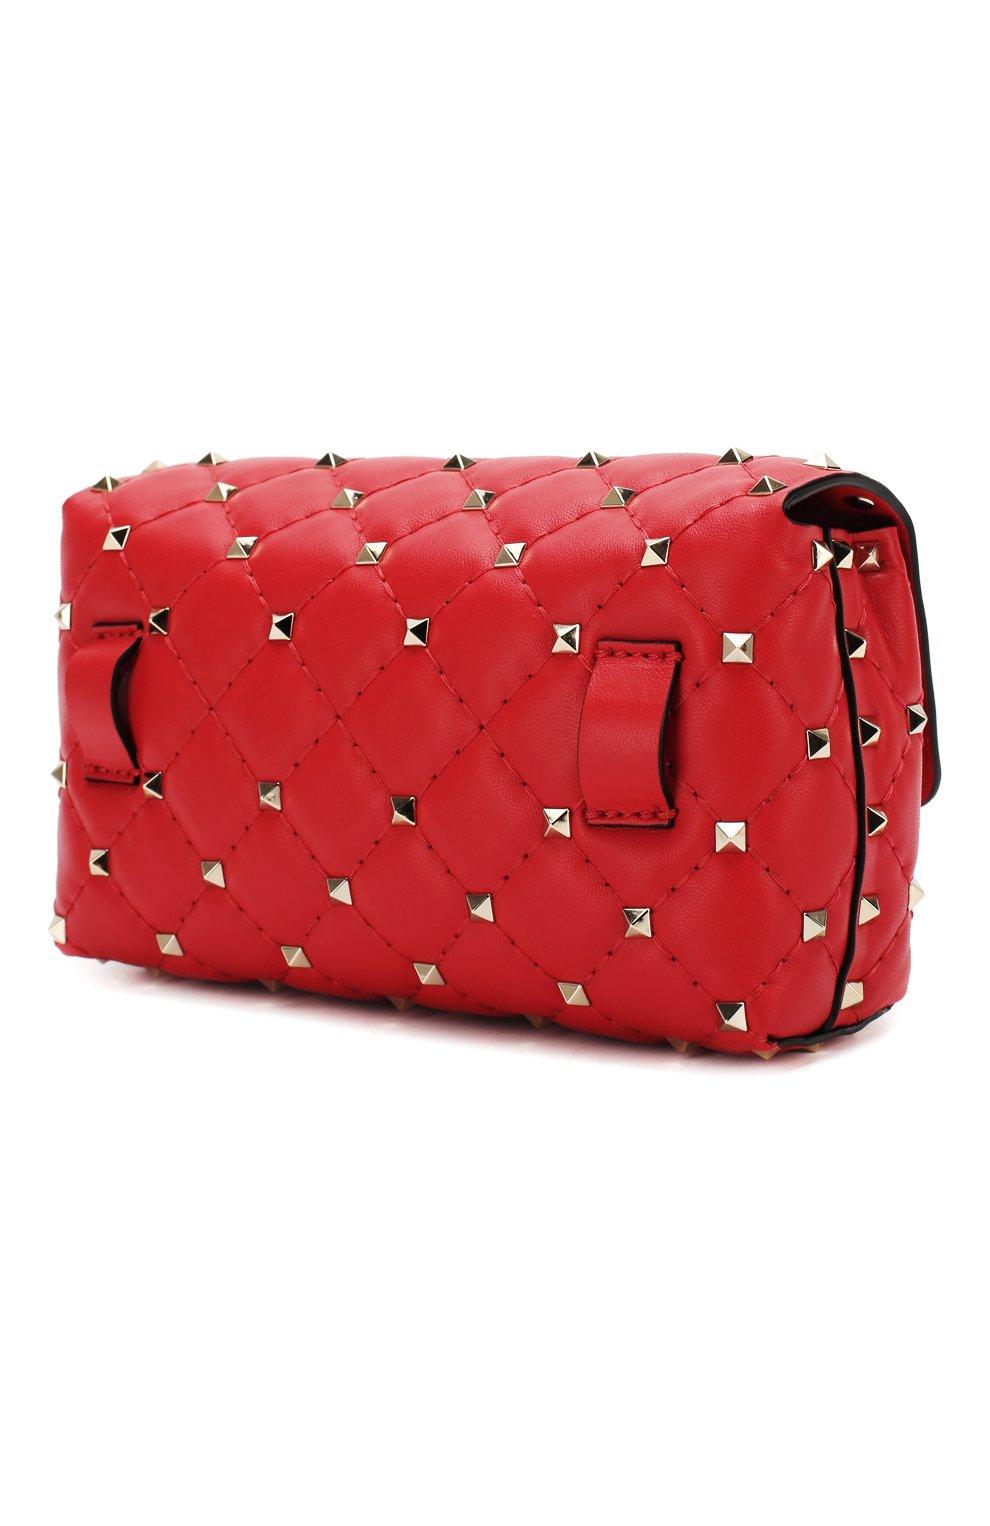 Поясная сумка Valentino Garavani Rockstud Spike small | Фото №3